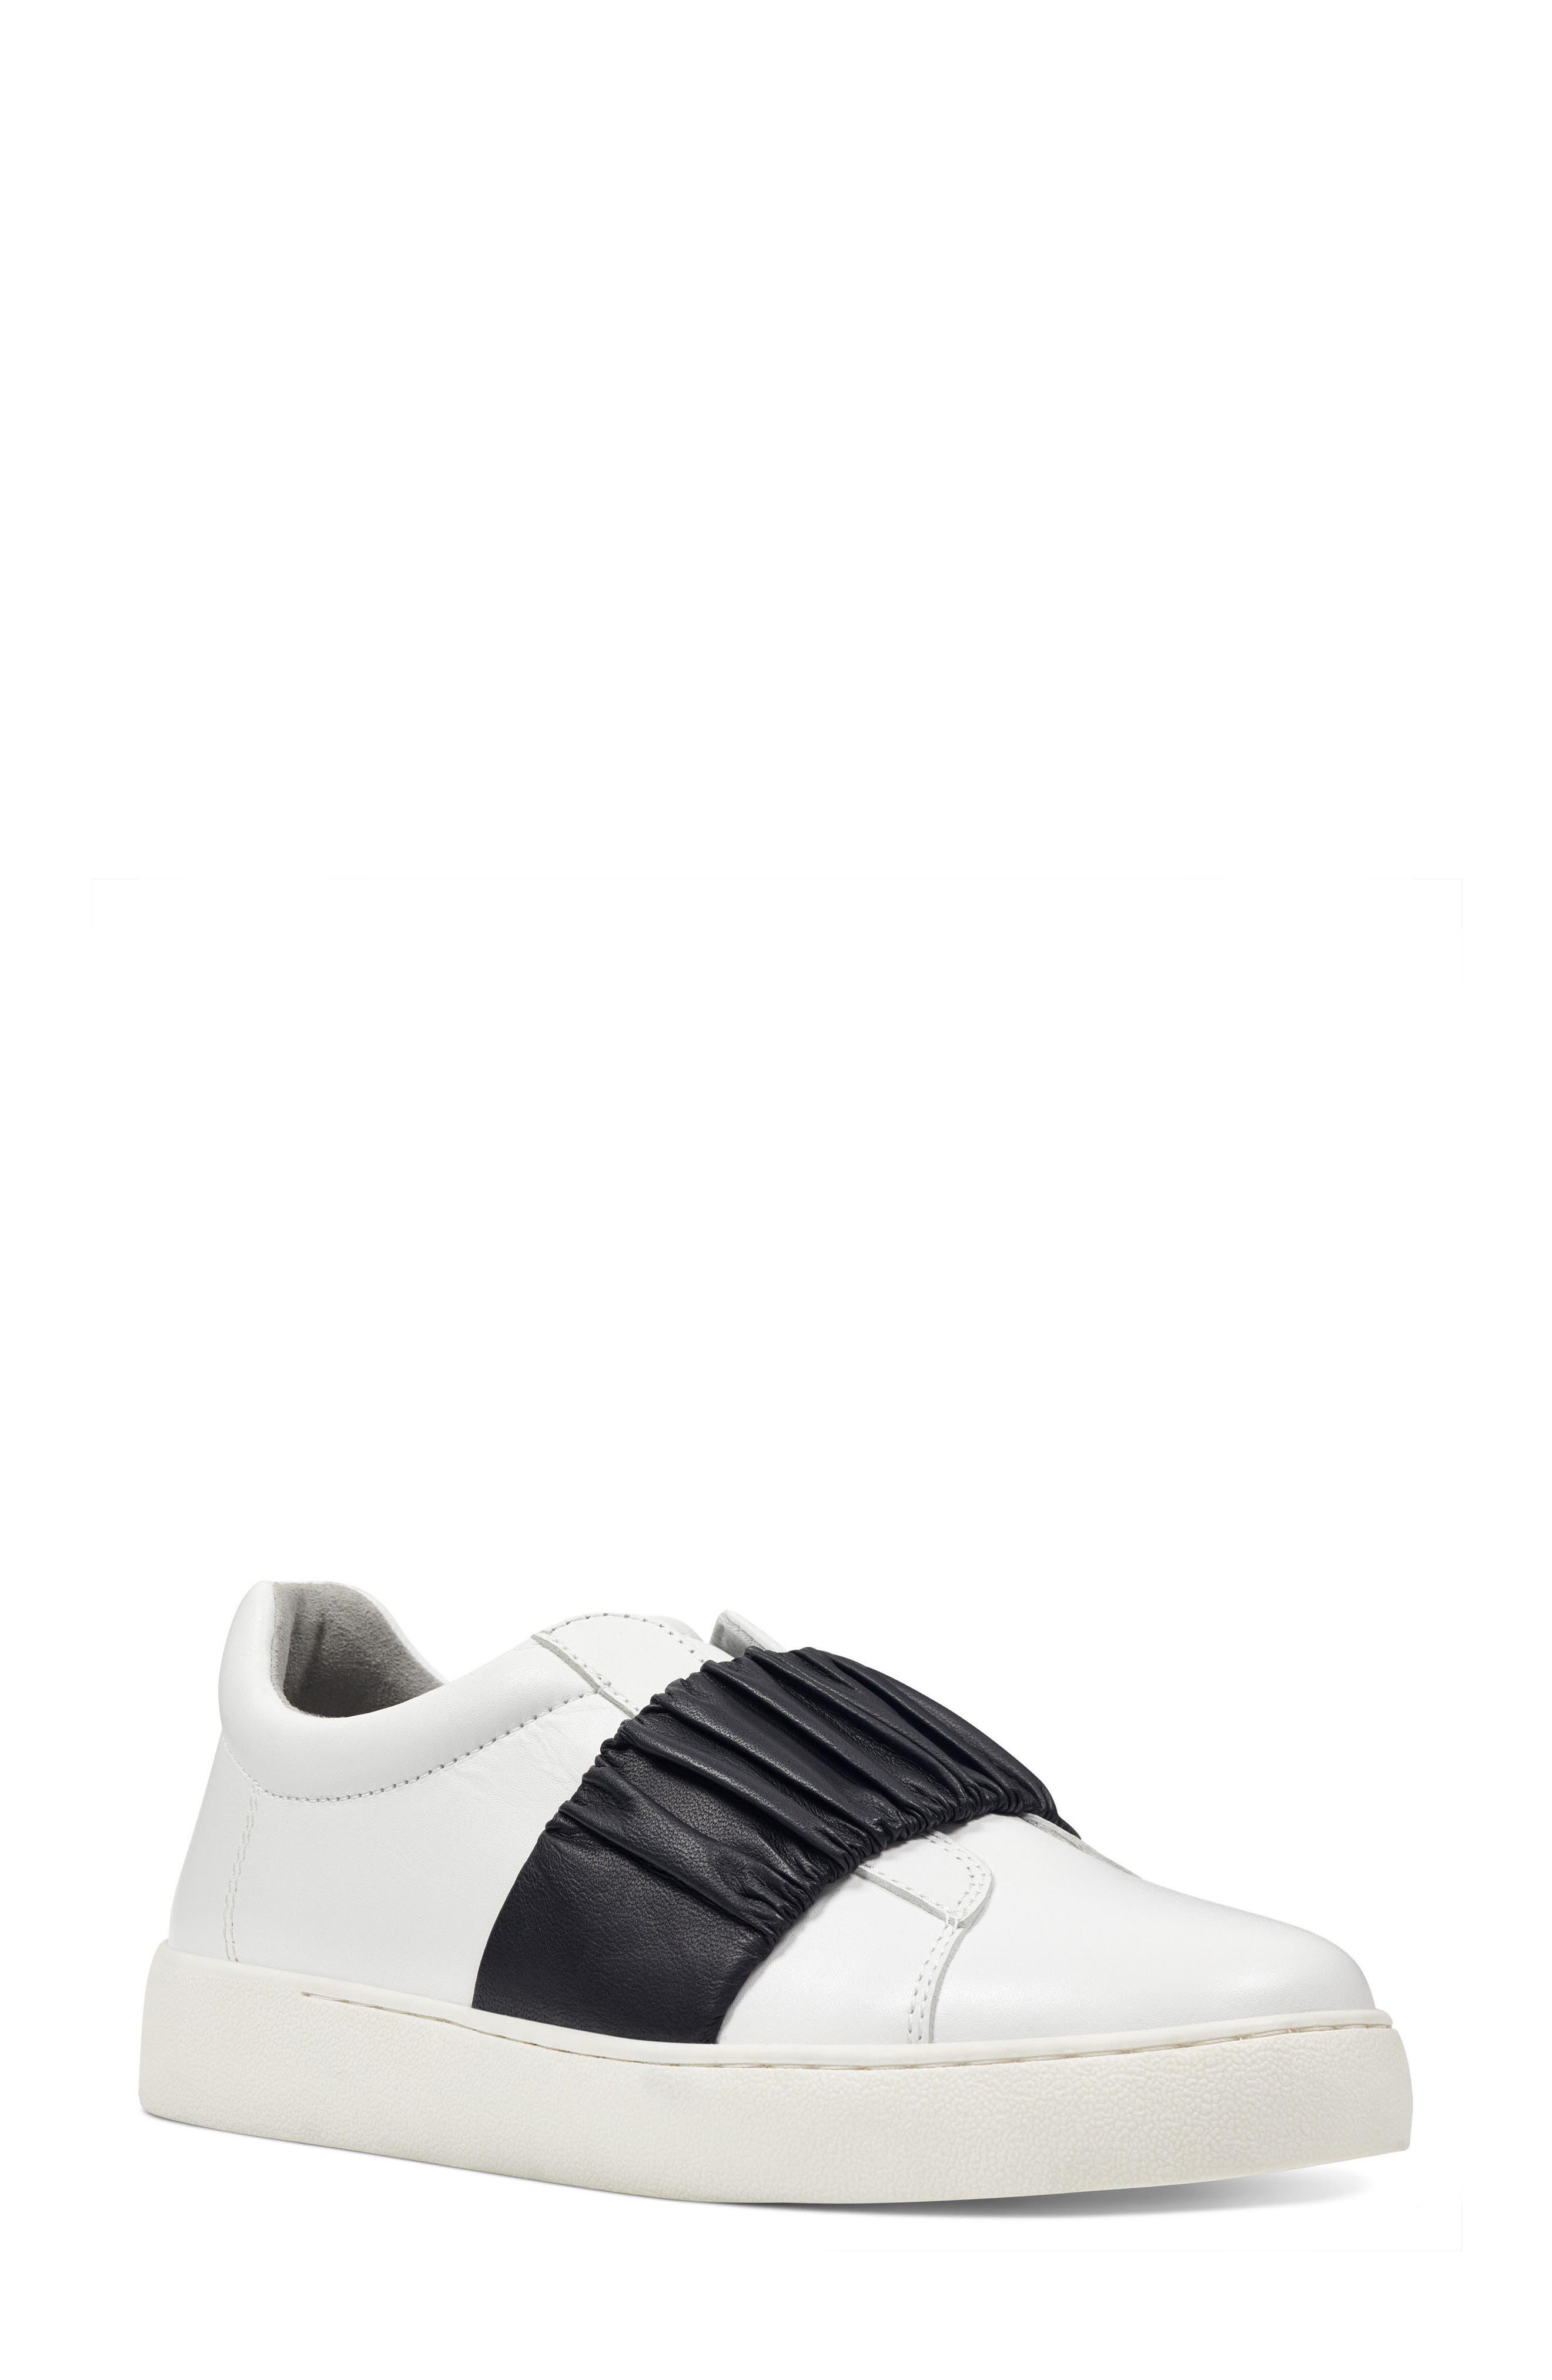 Pindiviah Slip-On Sneaker,                             Main thumbnail 1, color,                             White/ Black Leather